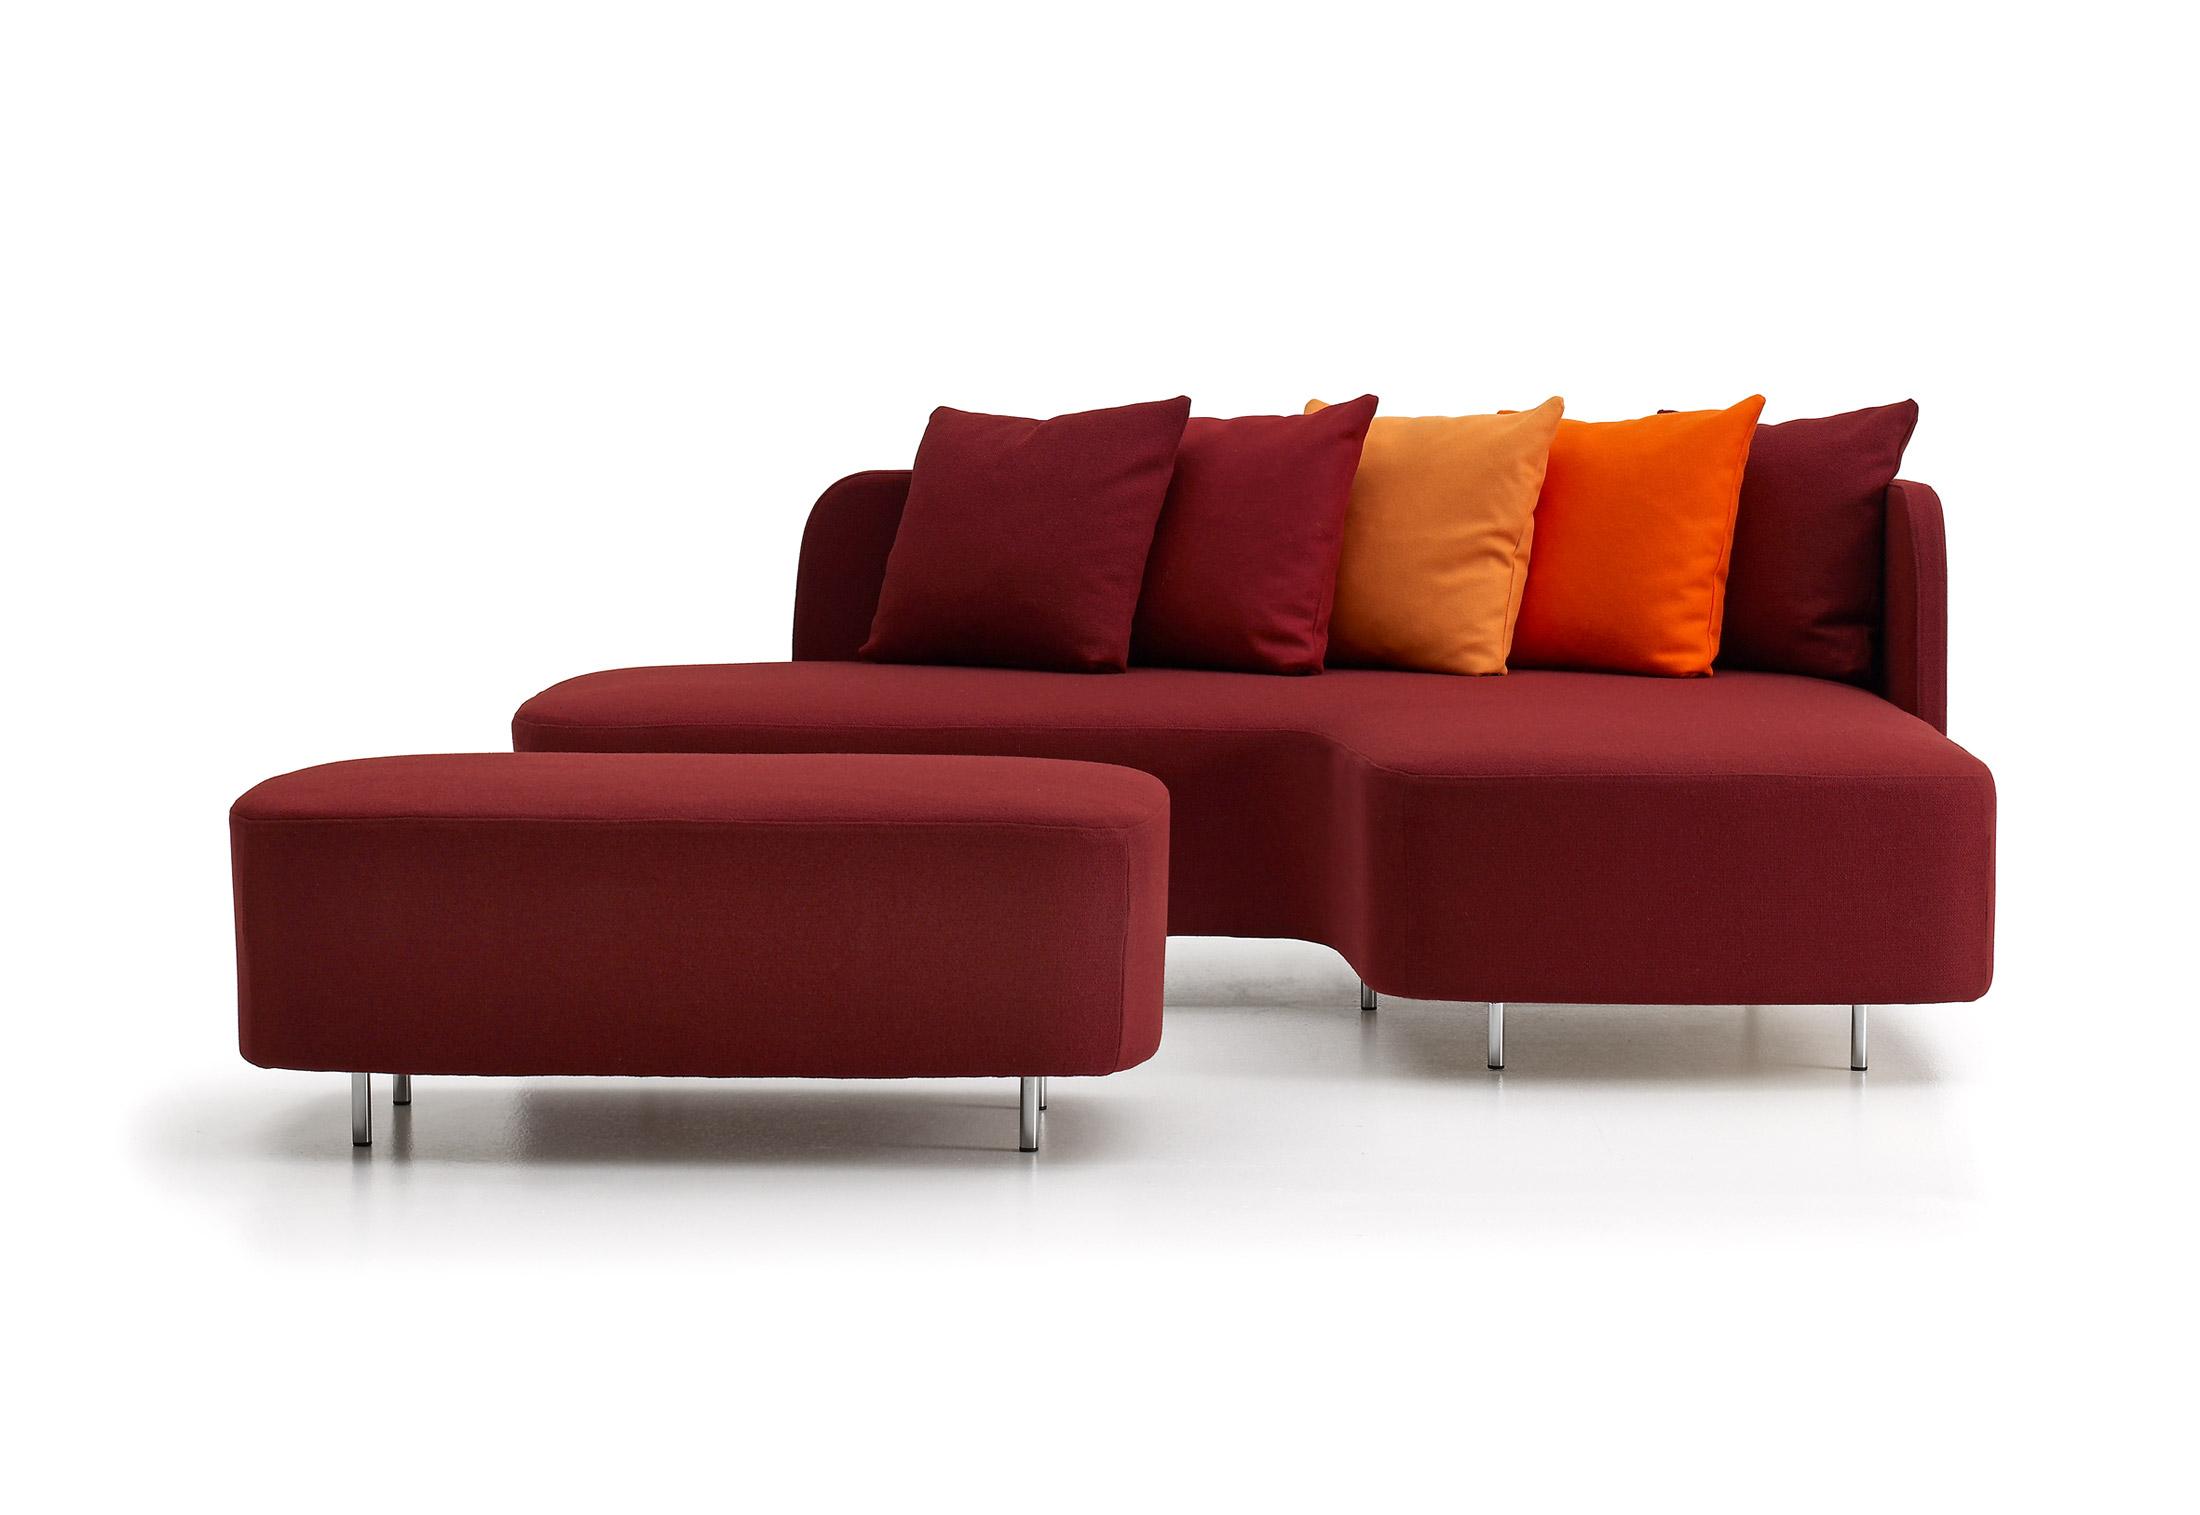 minima ecksofa von offecct stylepark. Black Bedroom Furniture Sets. Home Design Ideas